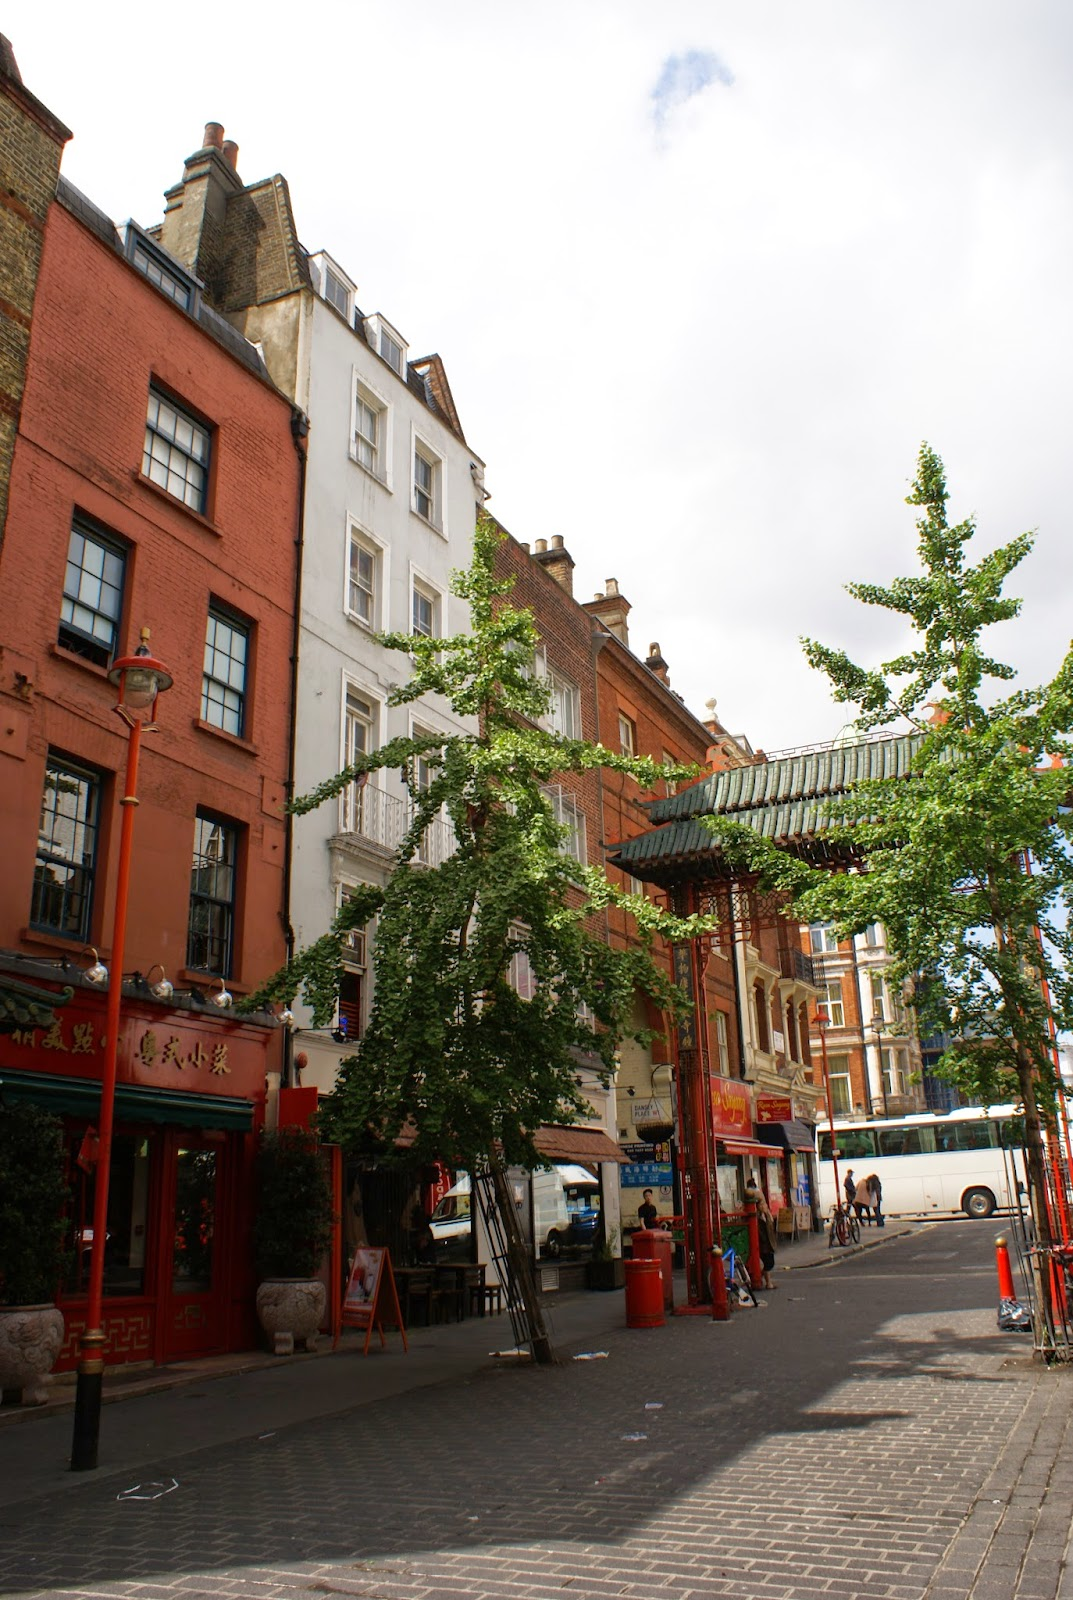 chinatown soho london uk england britain